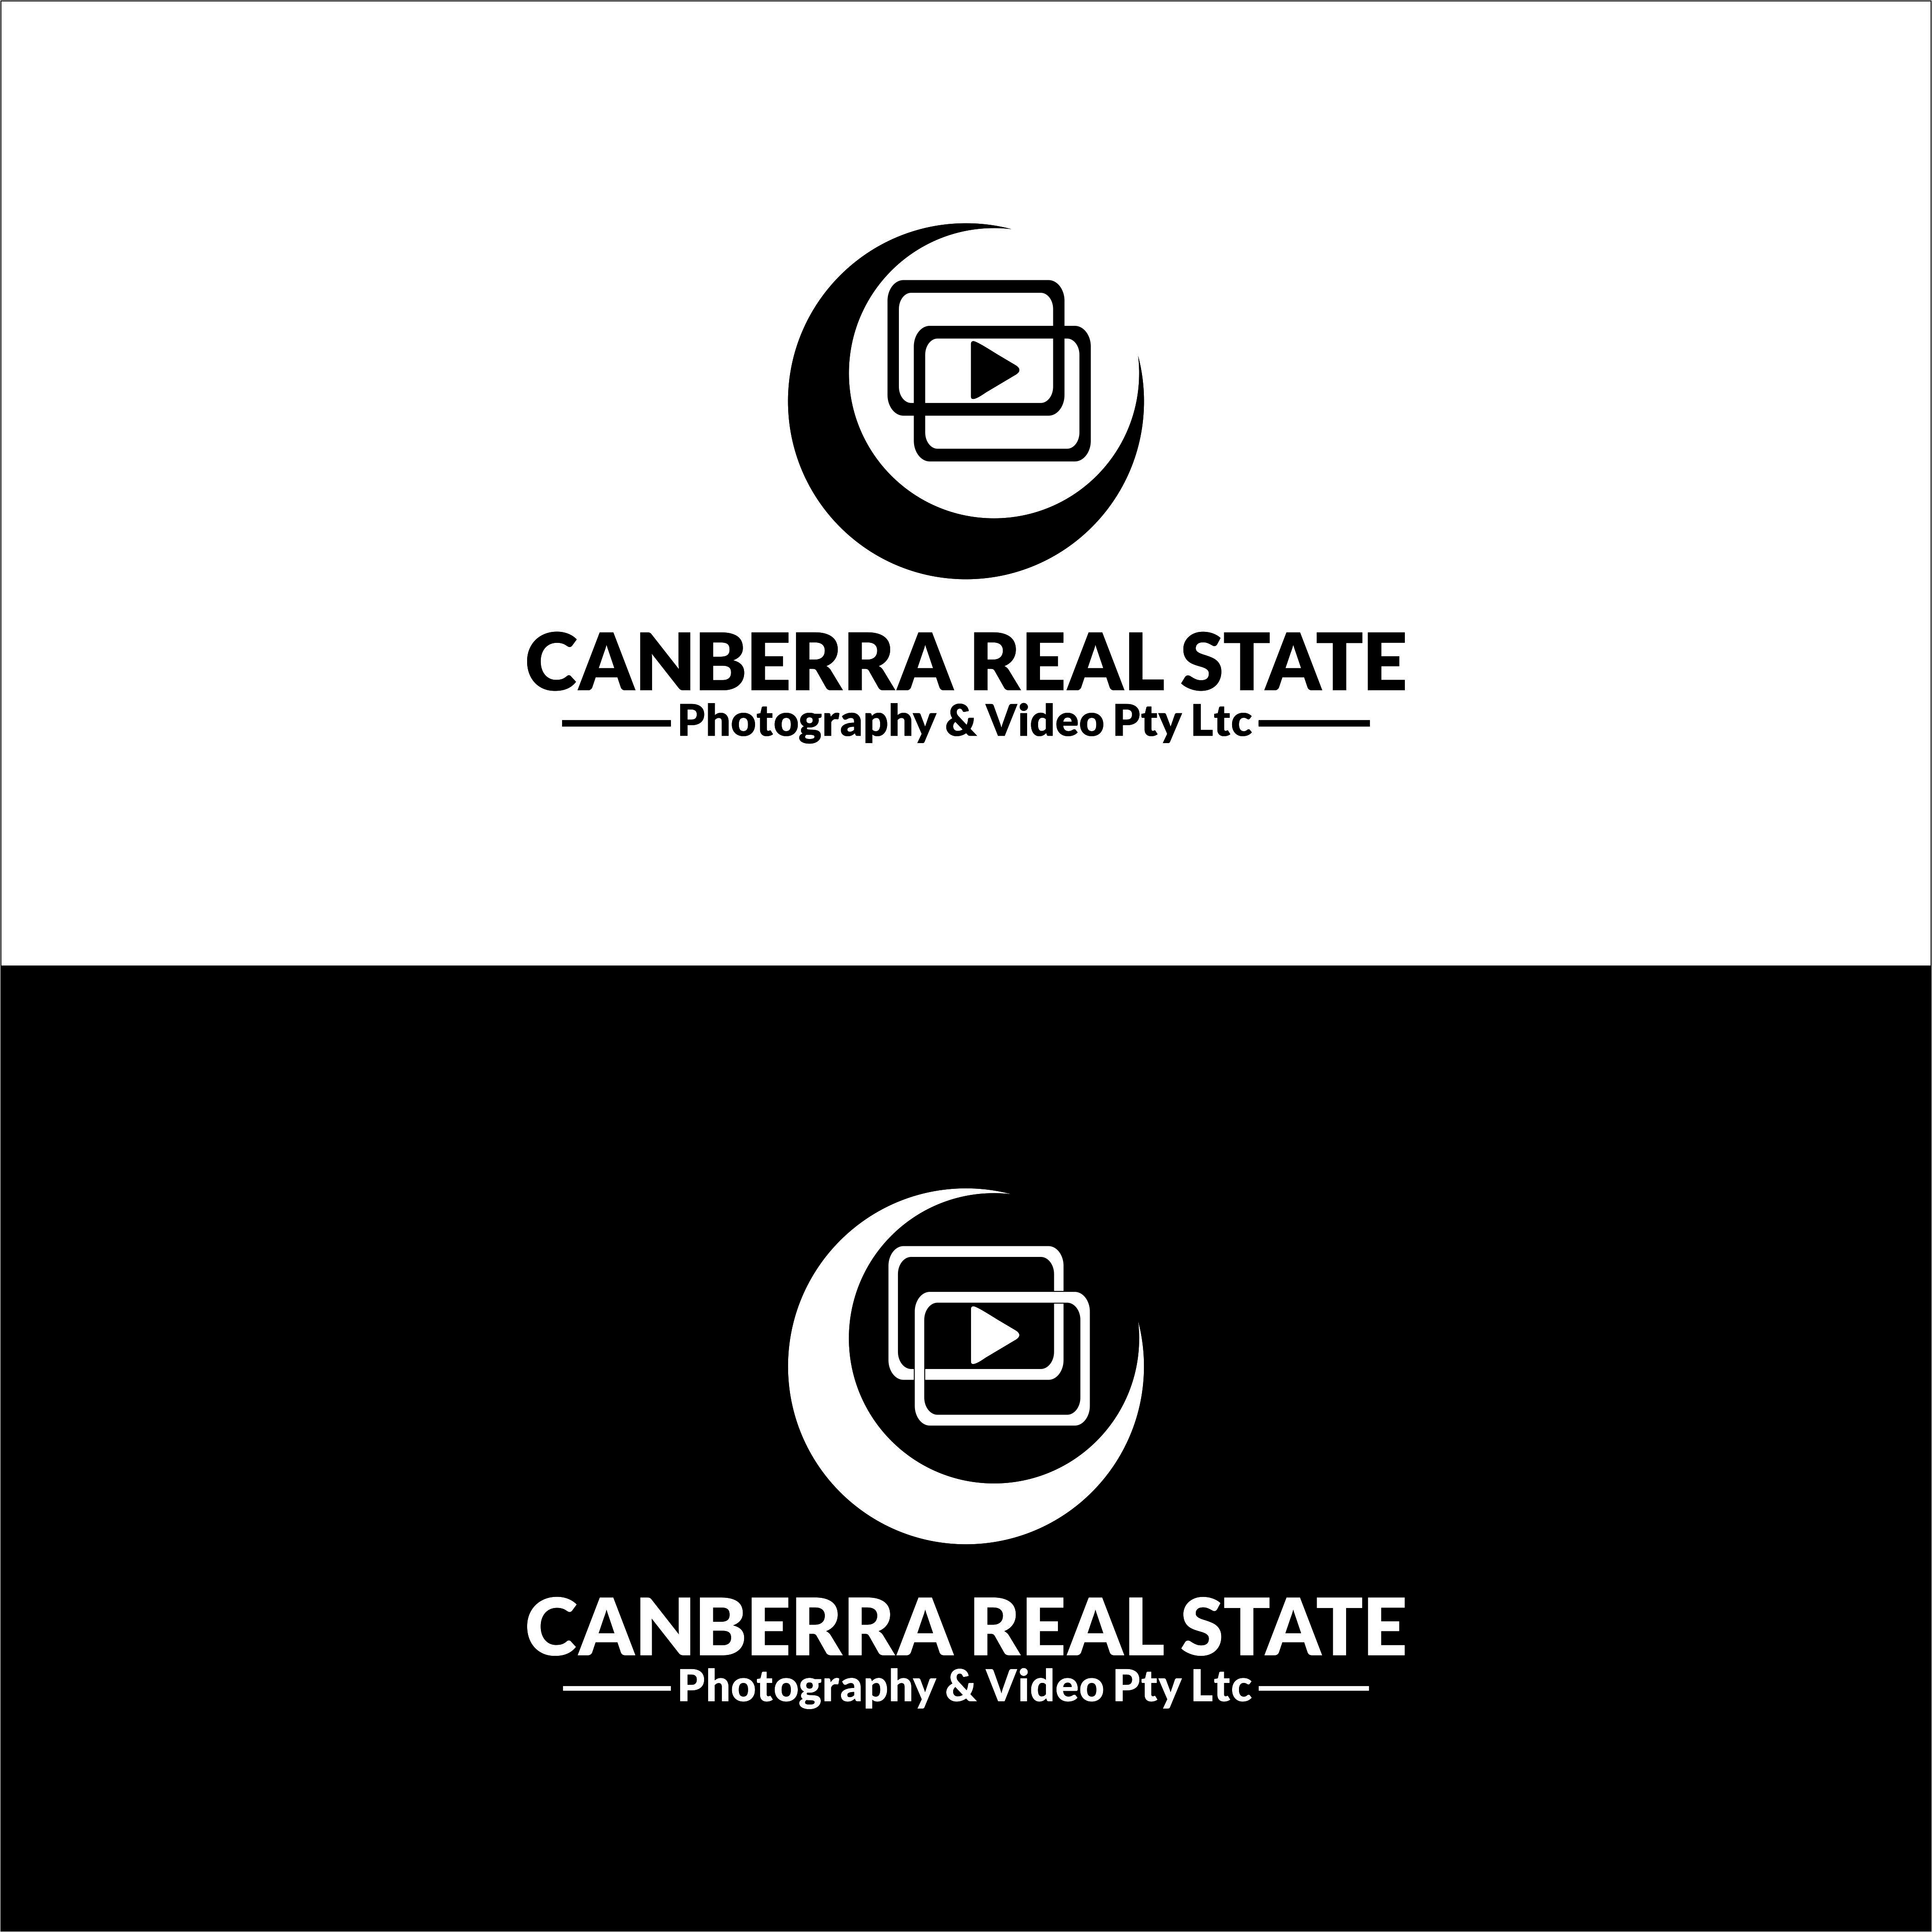 Logo Design by renren - Entry No. 14 in the Logo Design Contest Creative Logo Design for Canberra Real Estate Photography & Video Pty Ltd.